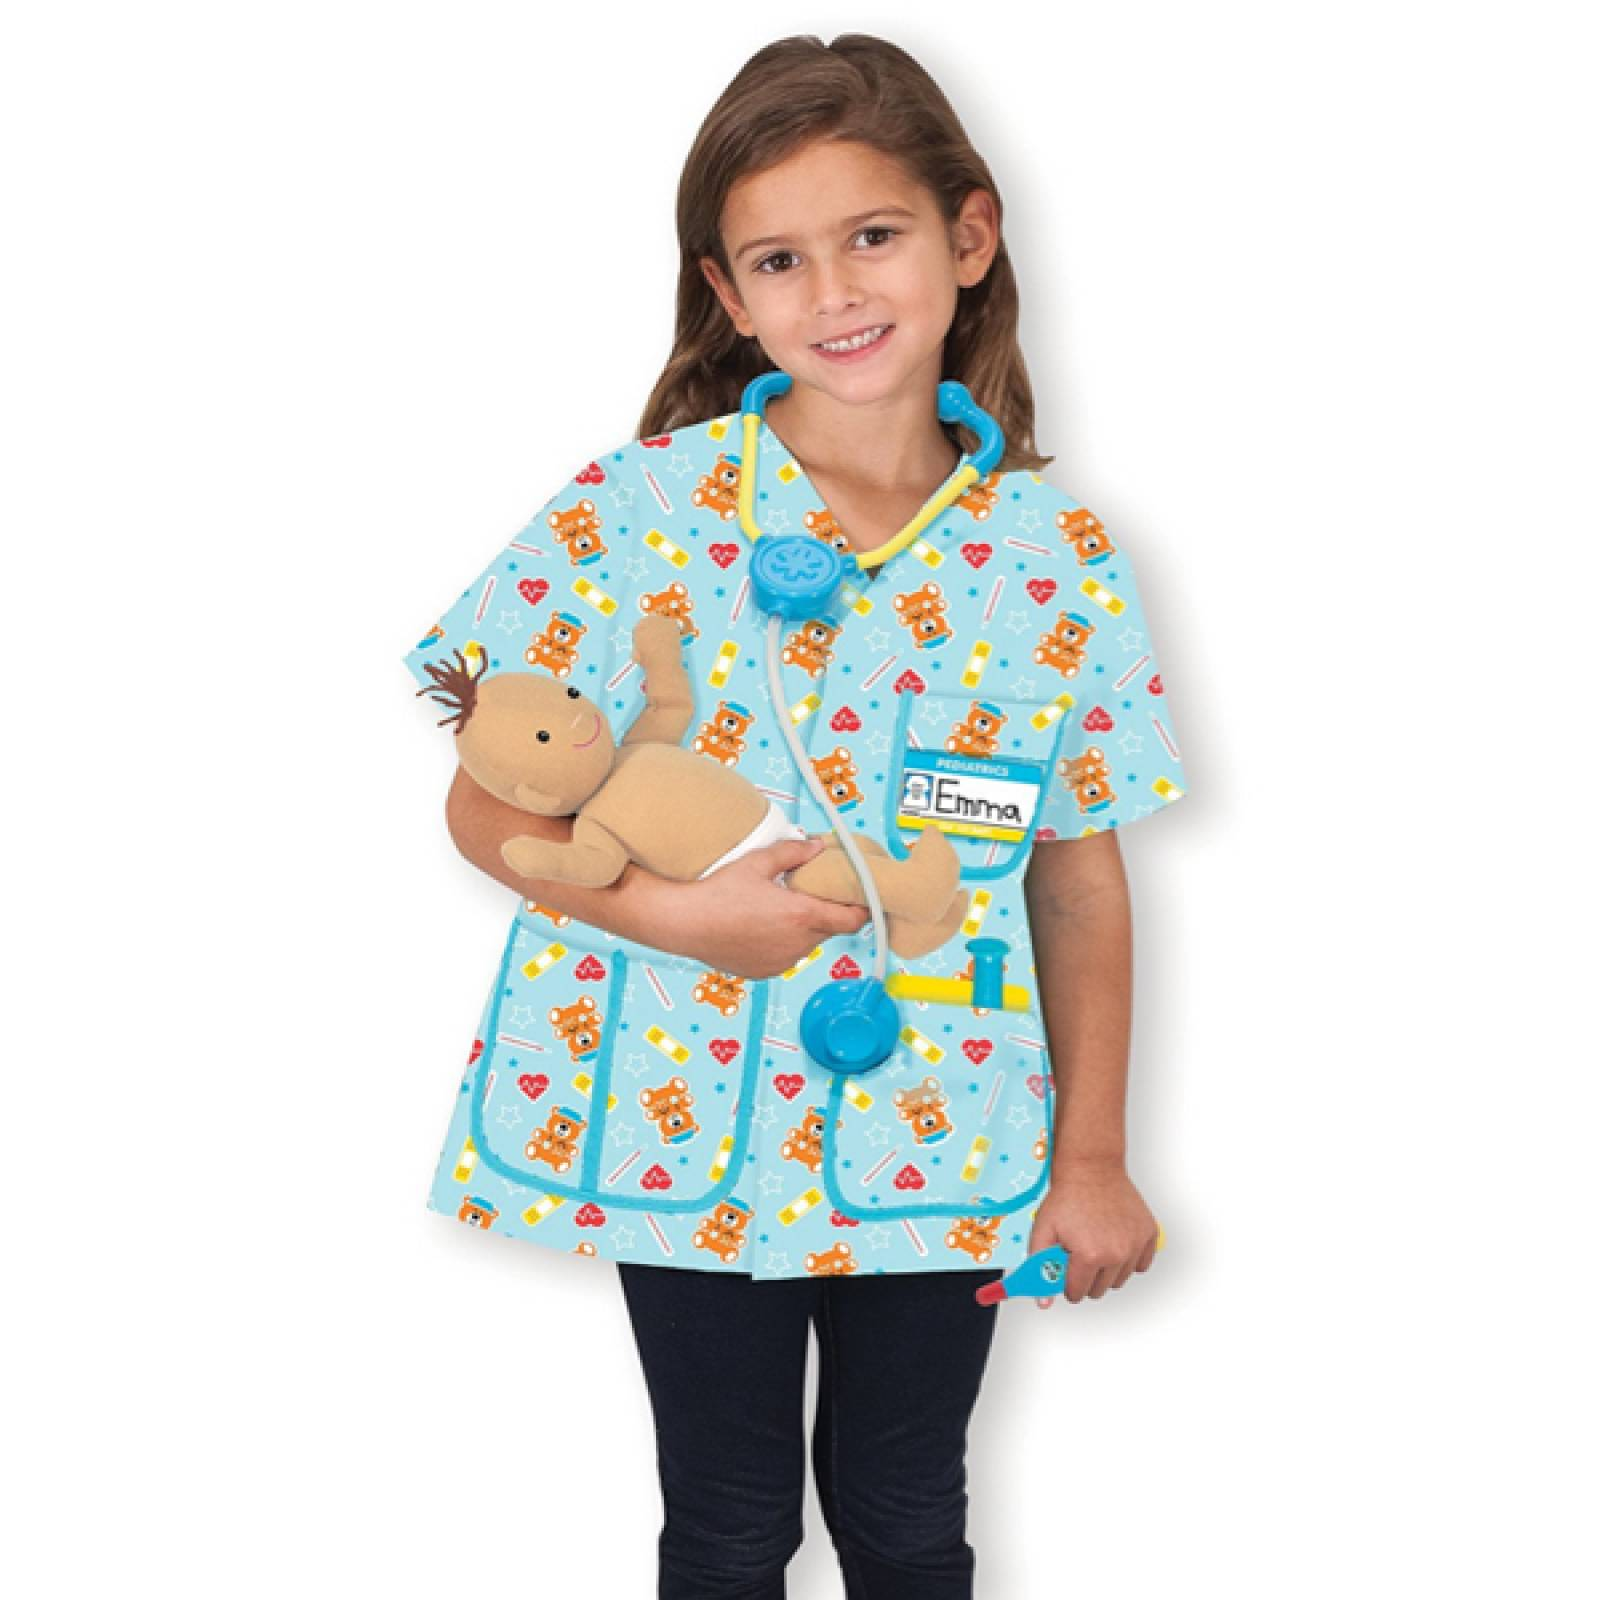 Fancy Dress Role Play Costume Set - Paedaiatric Nurse thumbnails